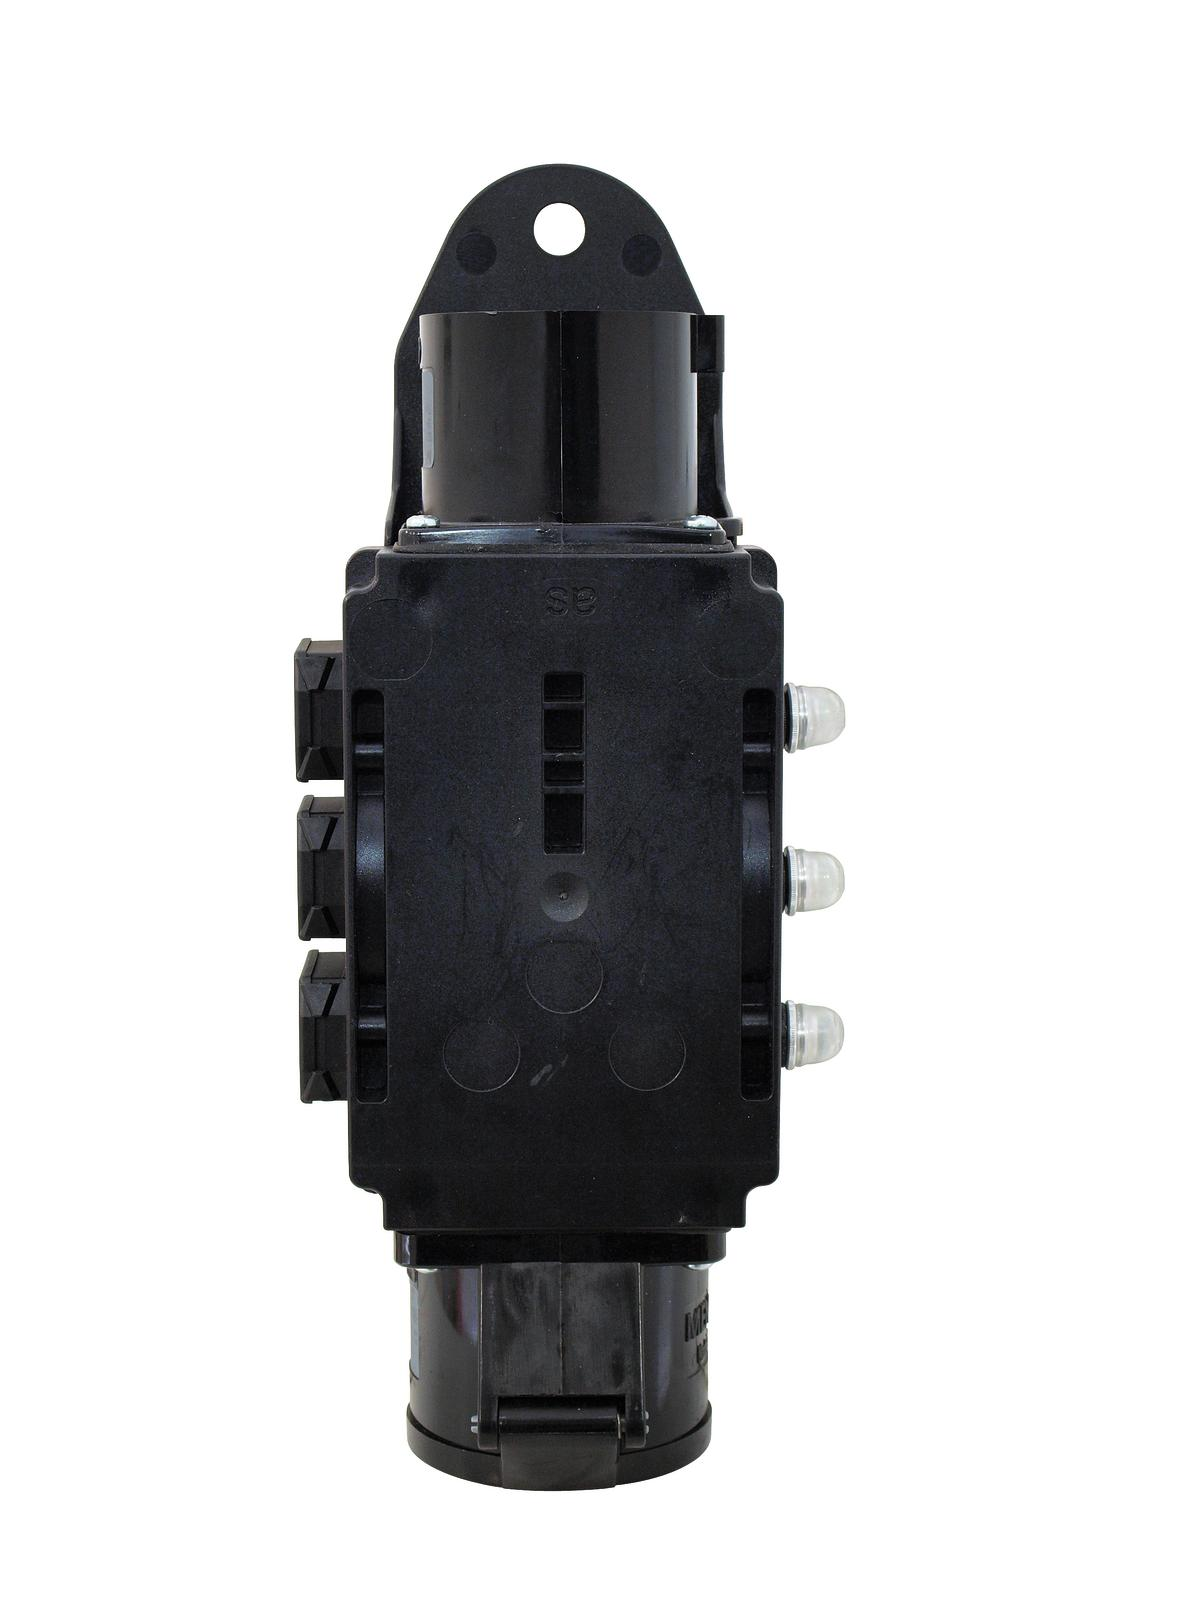 RIGPORT RPL-32 Stromverteiler